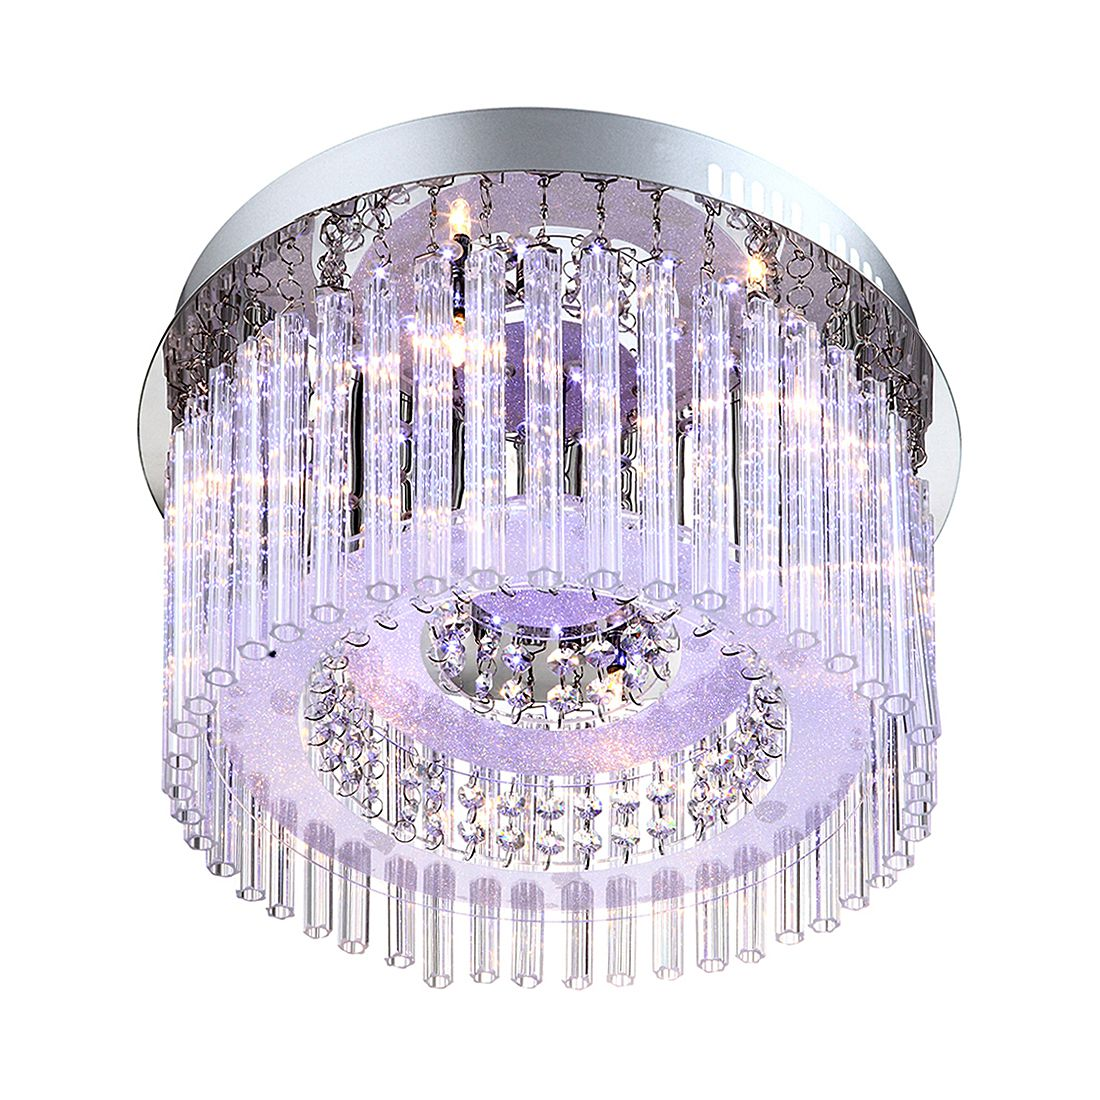 EEK A++, Deckenleuchte JOYCE – Metall/Kunststoff – Silber – 6-flammig, Globo Lighting günstig bestellen